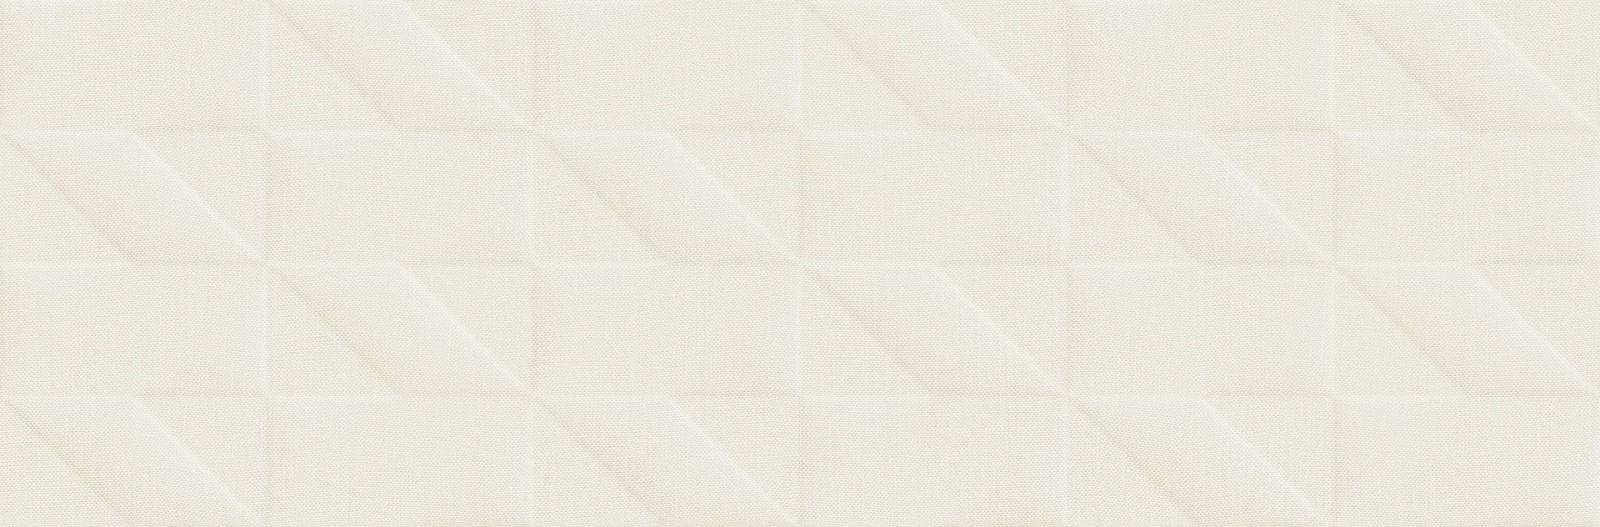 Стенни плочки Outfit Ice Struttura Tetris 3D 25x76